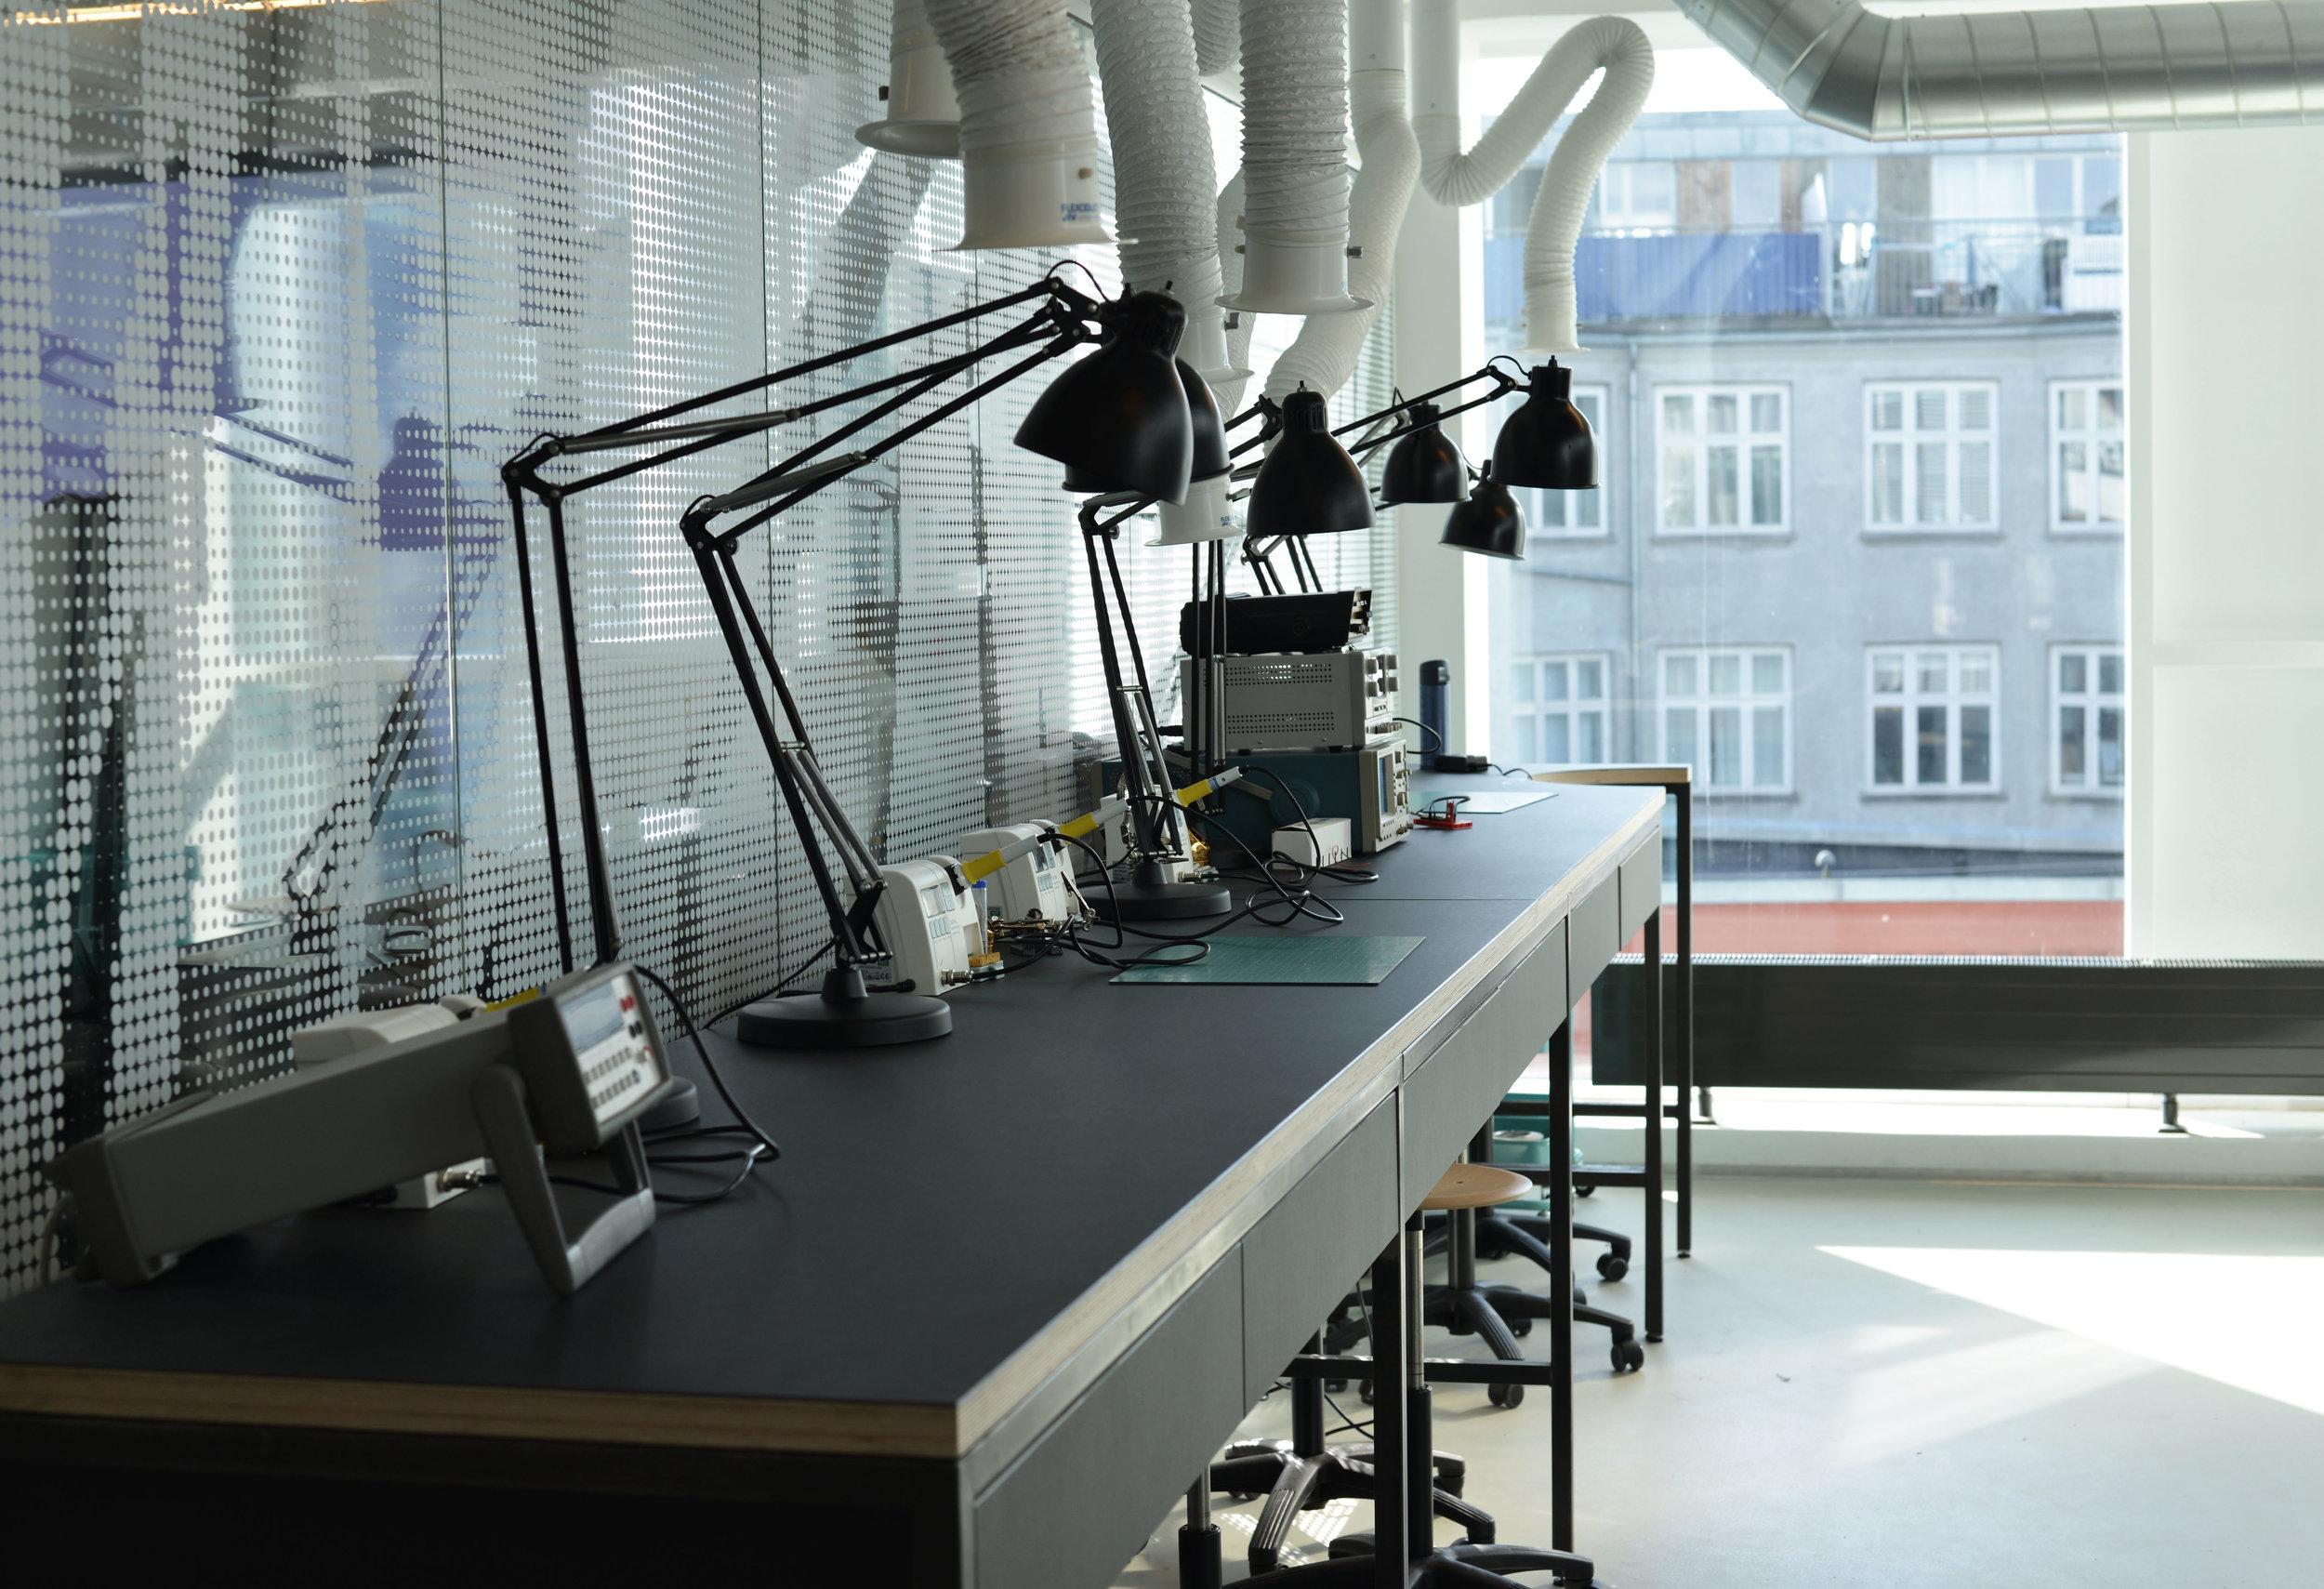 Lab Space - Soldering Station.jpg